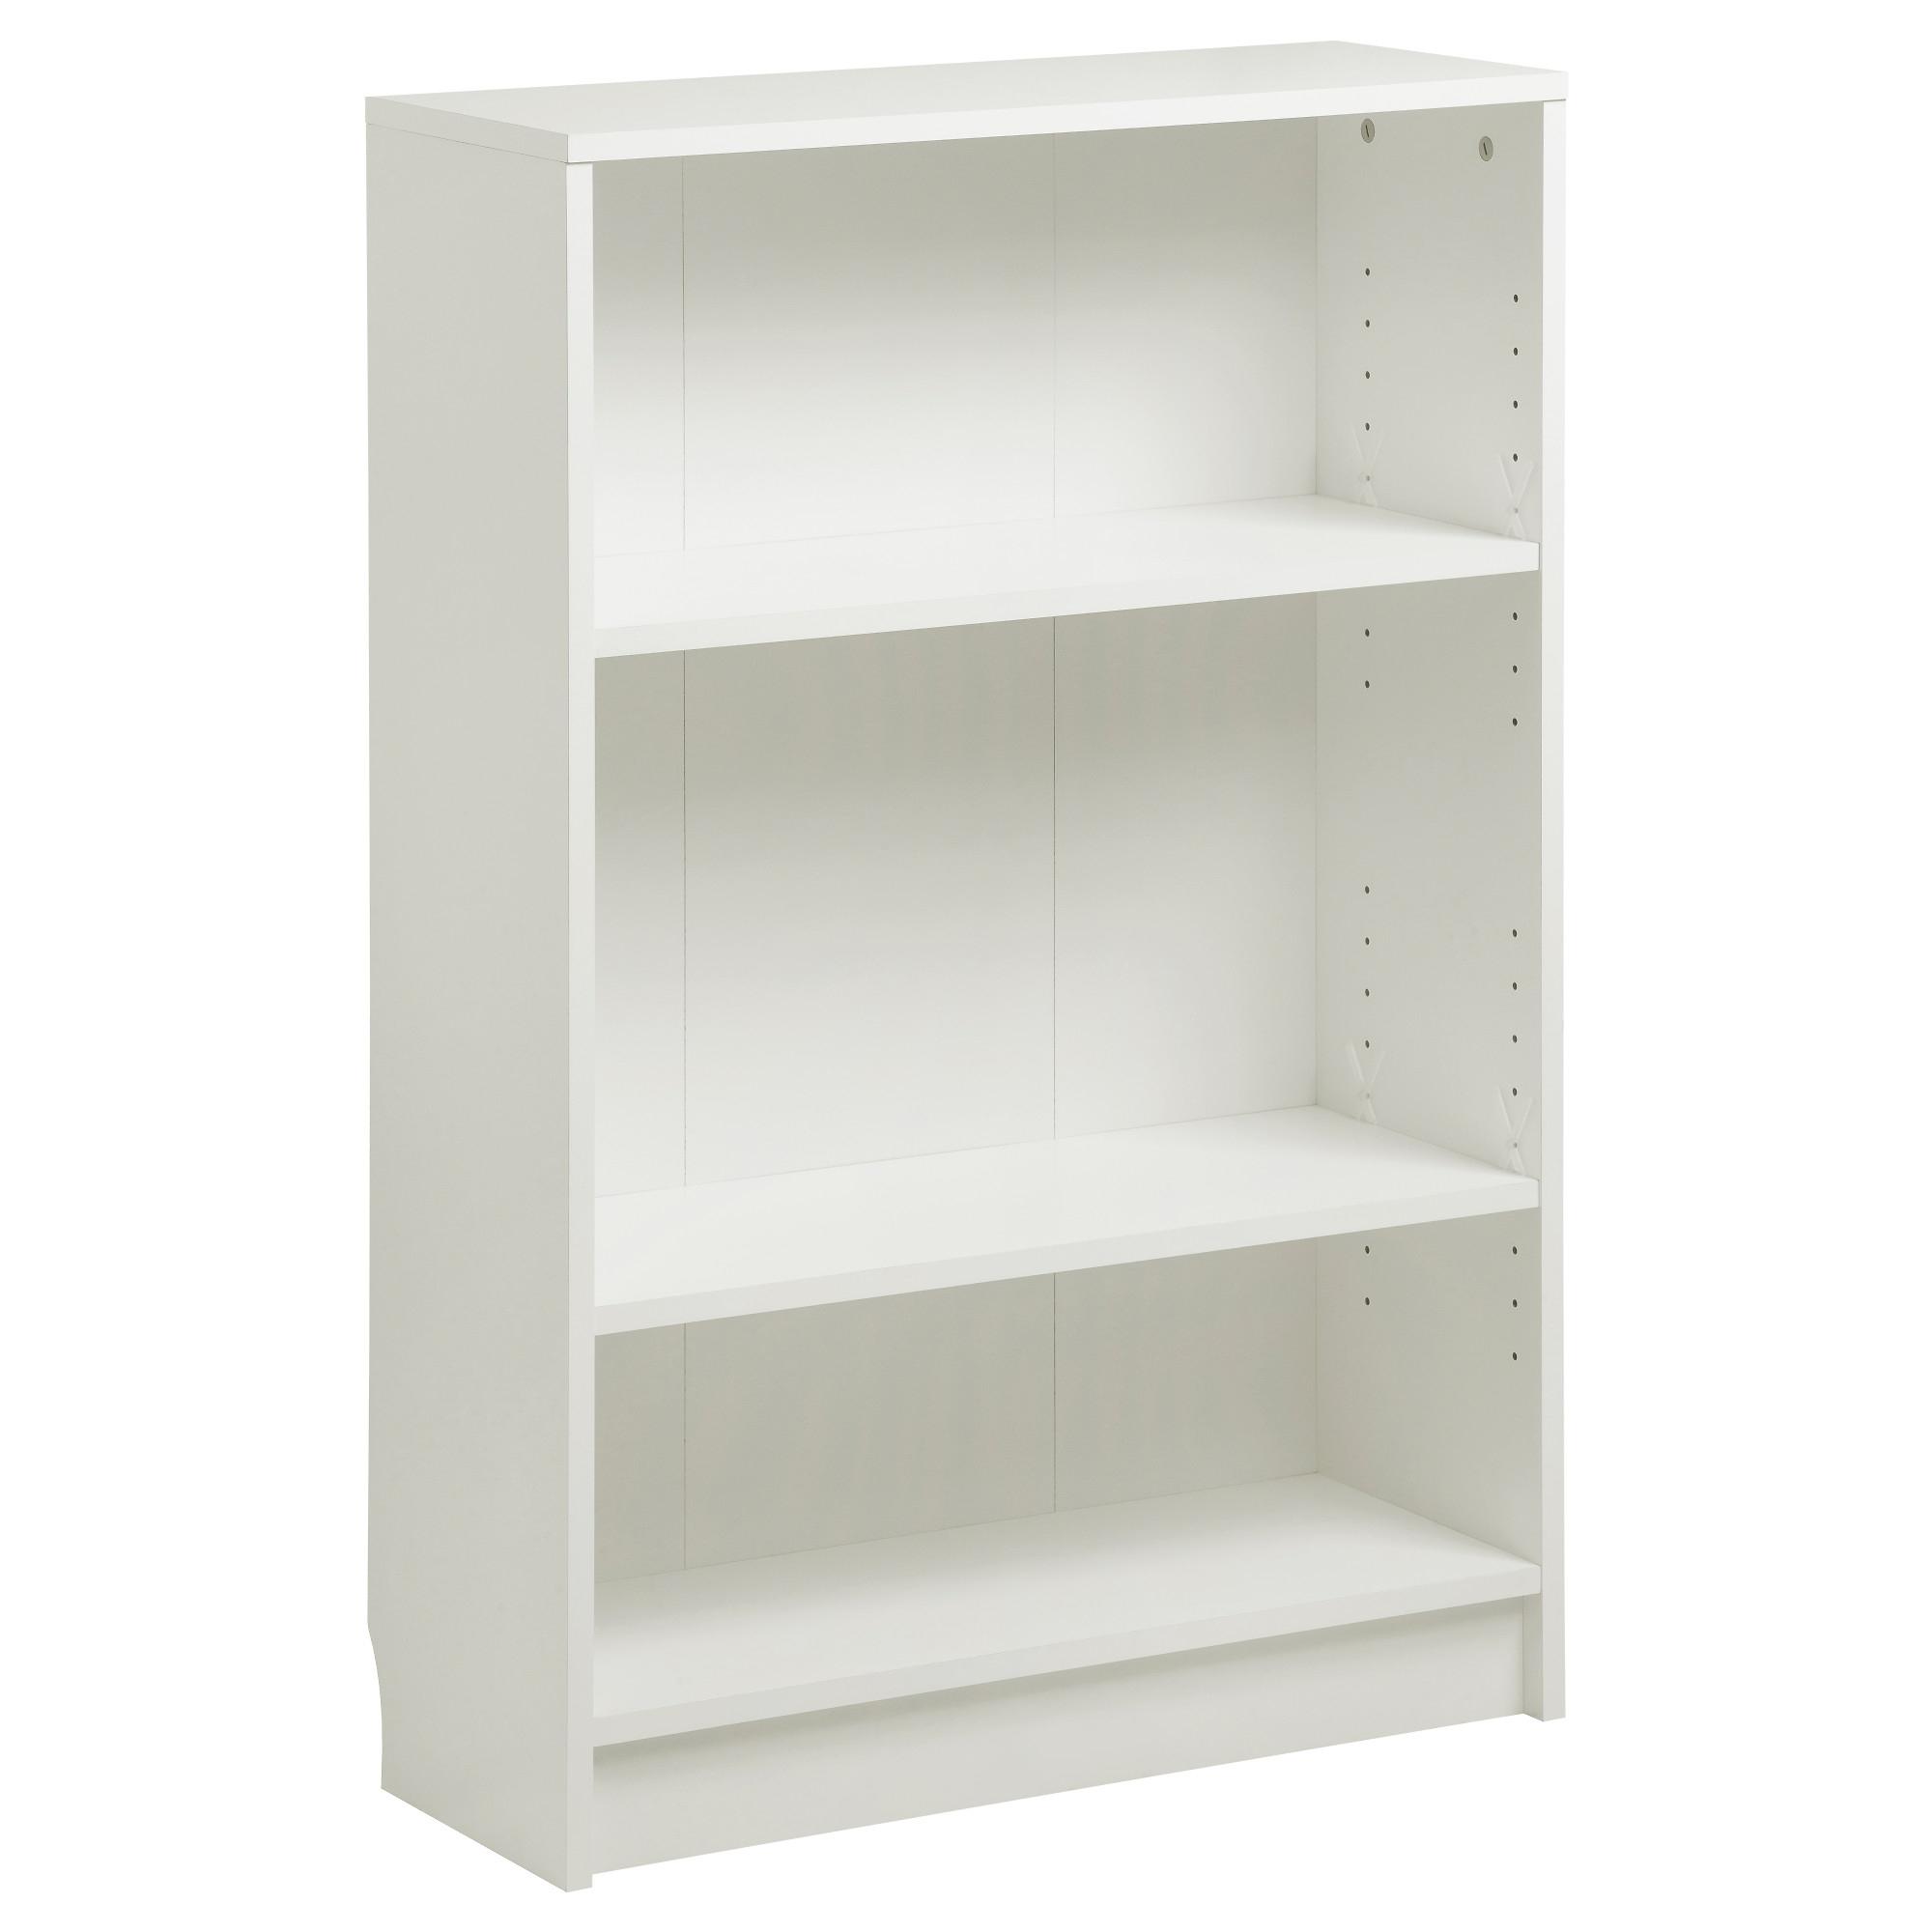 Ikea Regarding 2017 Ikea Corner Bookcases (View 8 of 15)